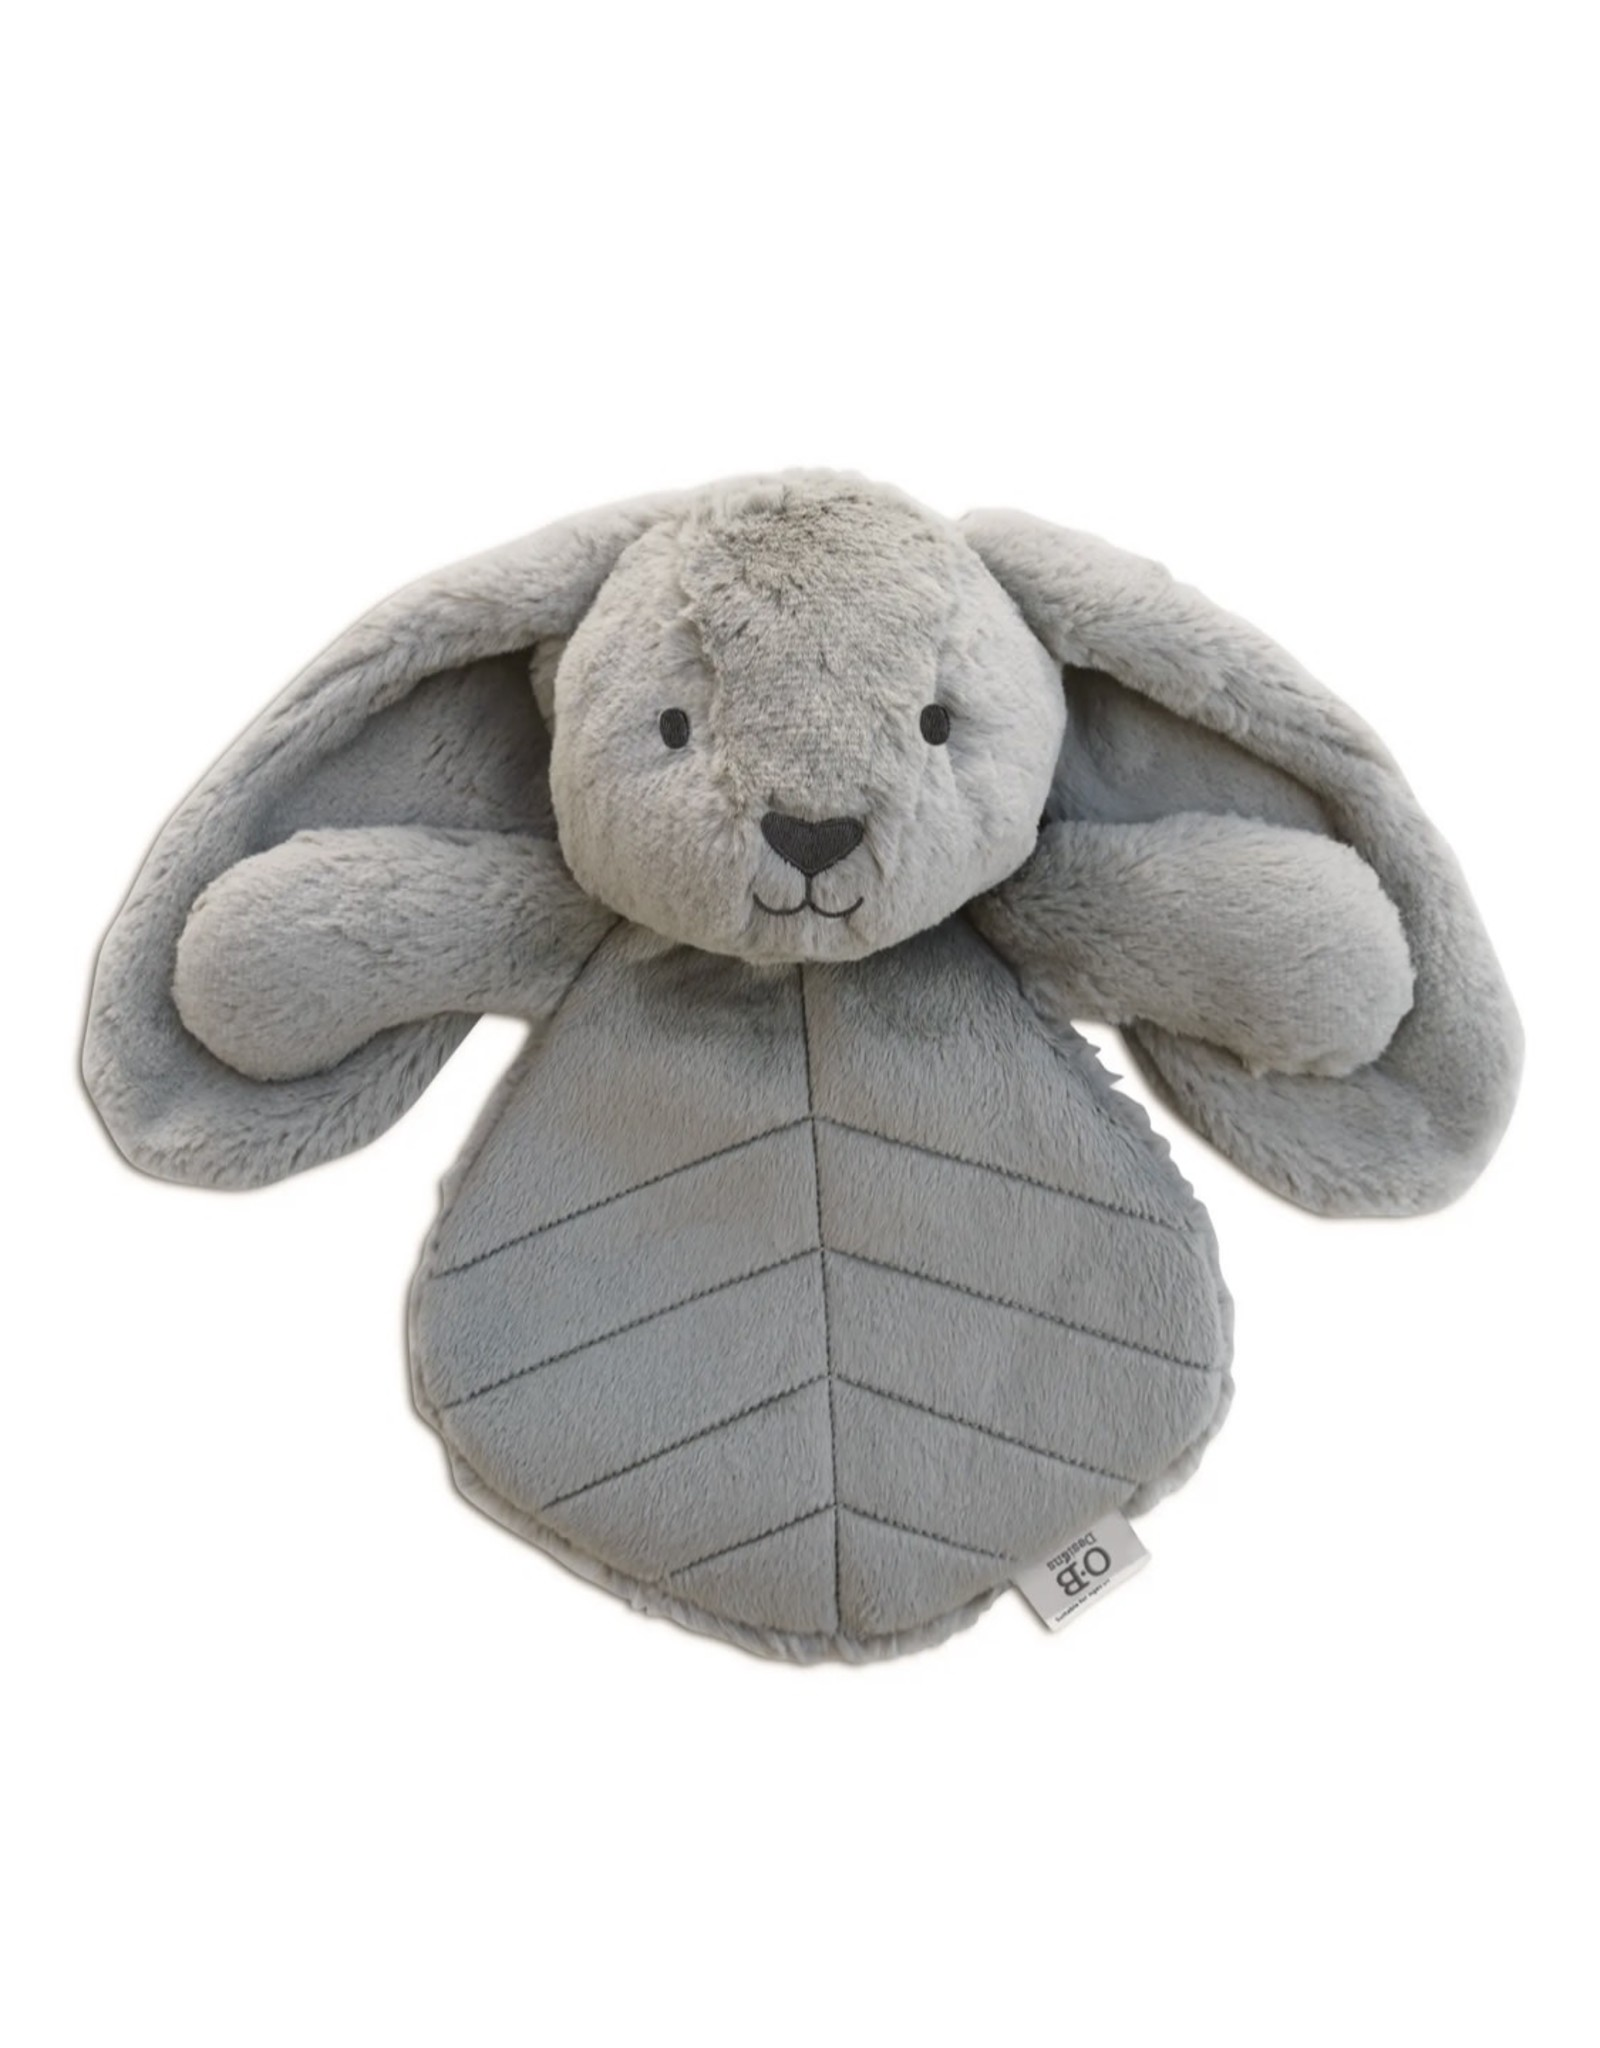 OB Designs OB Designs- Bodhi Bunny Lovey Toy